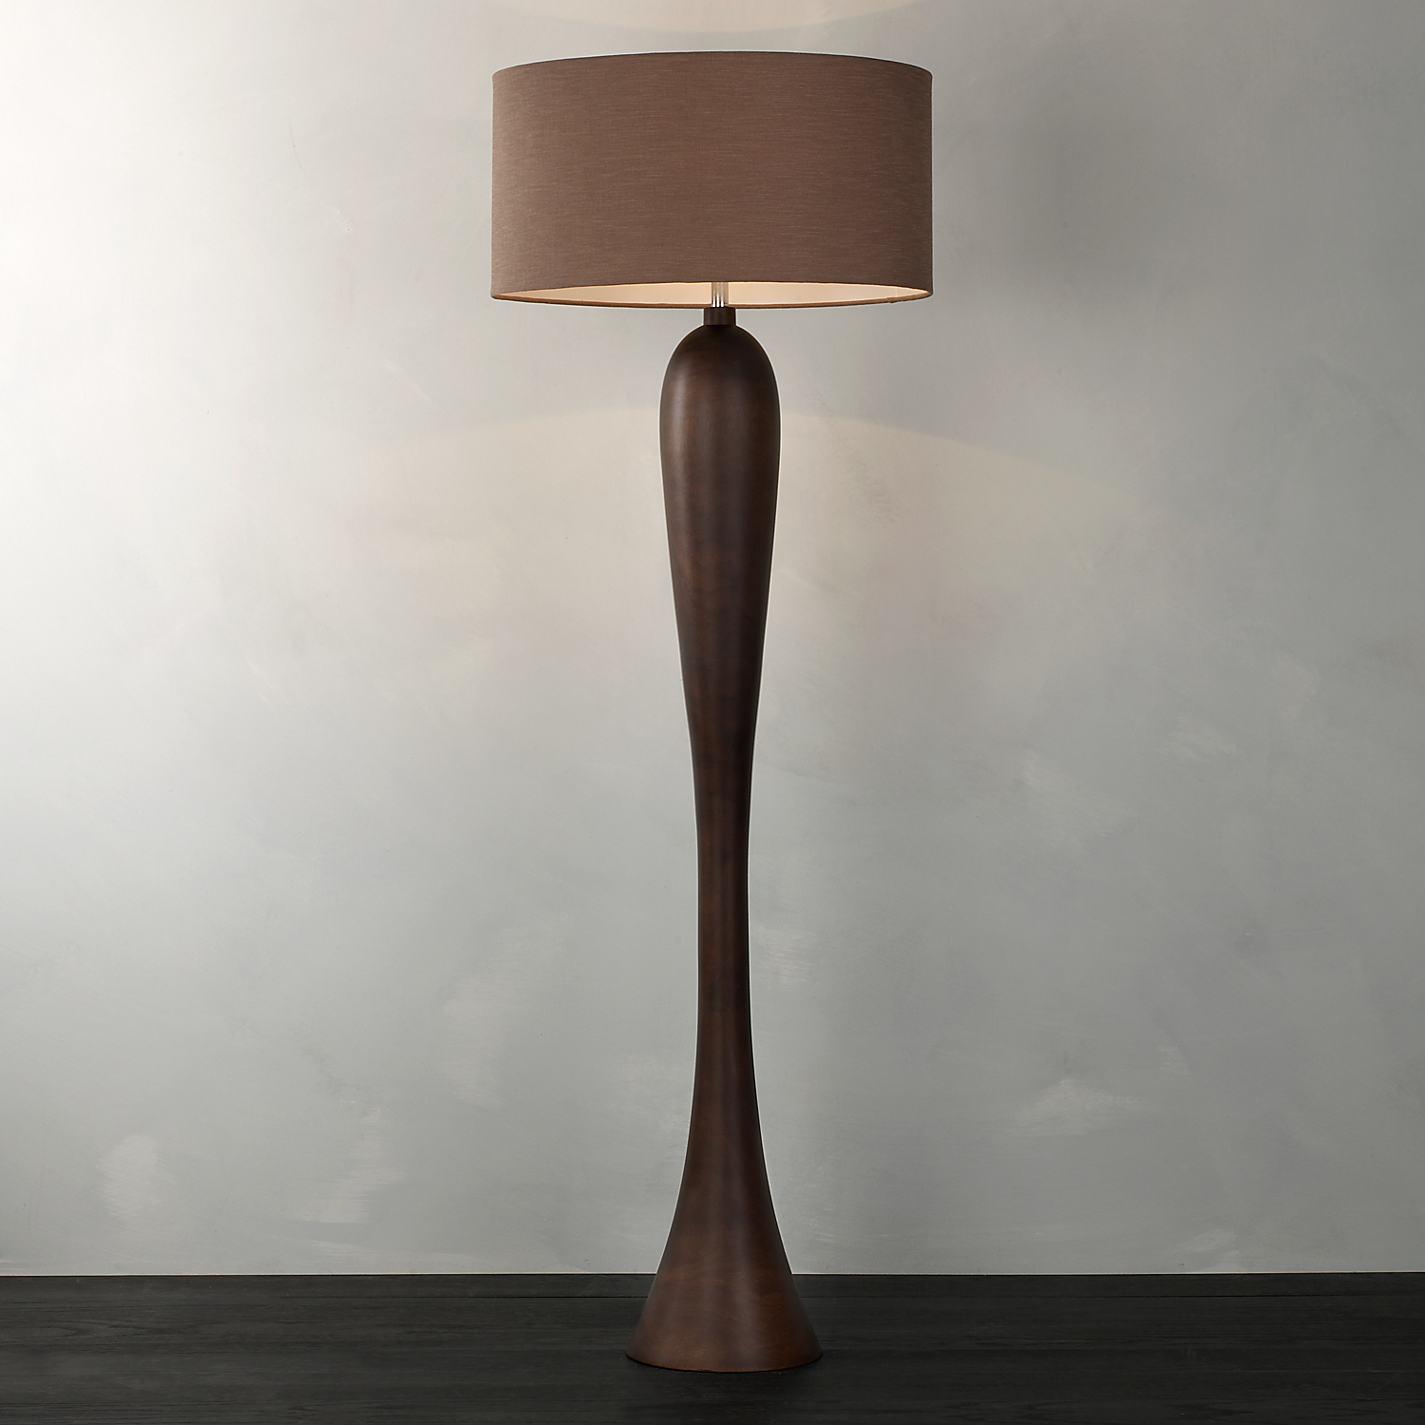 standard lamps living room floor lamps WQDFJIQ